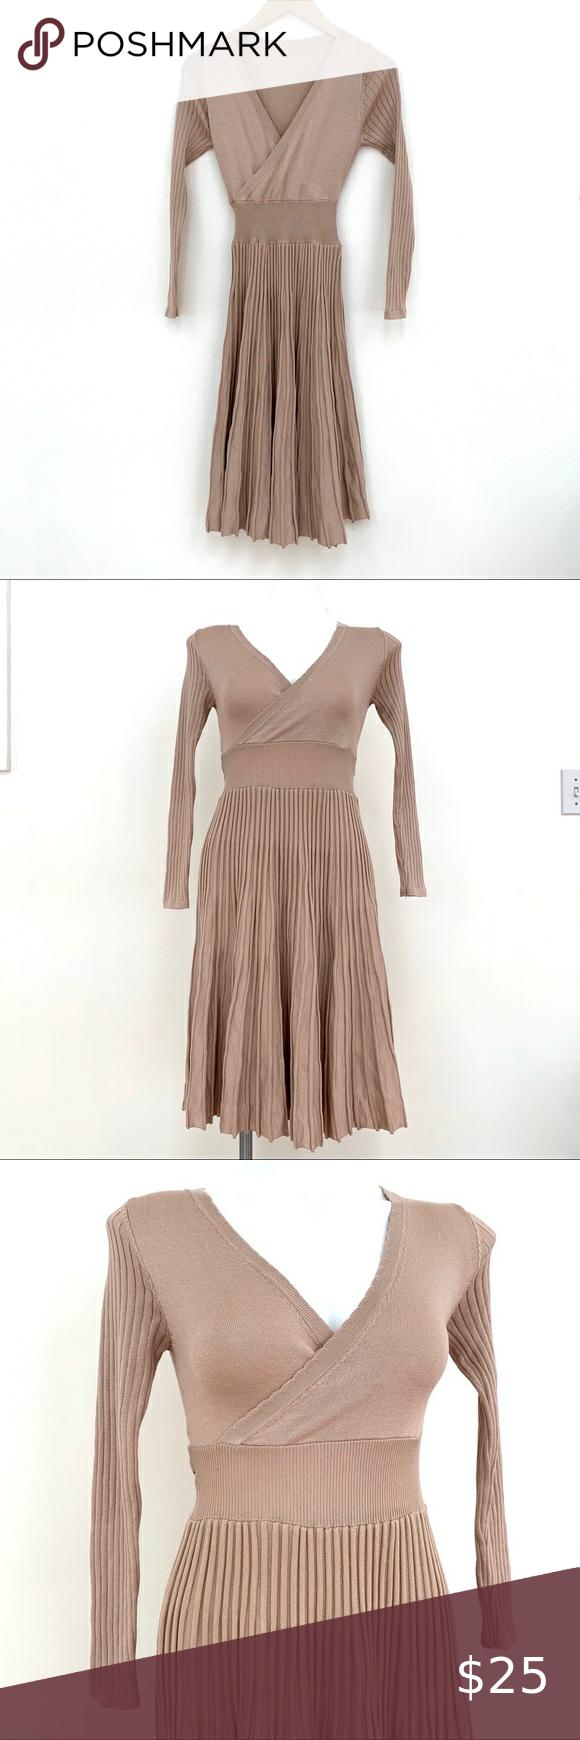 Tan Ribbed Long Sleeve Sweater Dress Size Small Sweater Dress Trending Outfits Long Sleeve Sweater [ 1740 x 580 Pixel ]